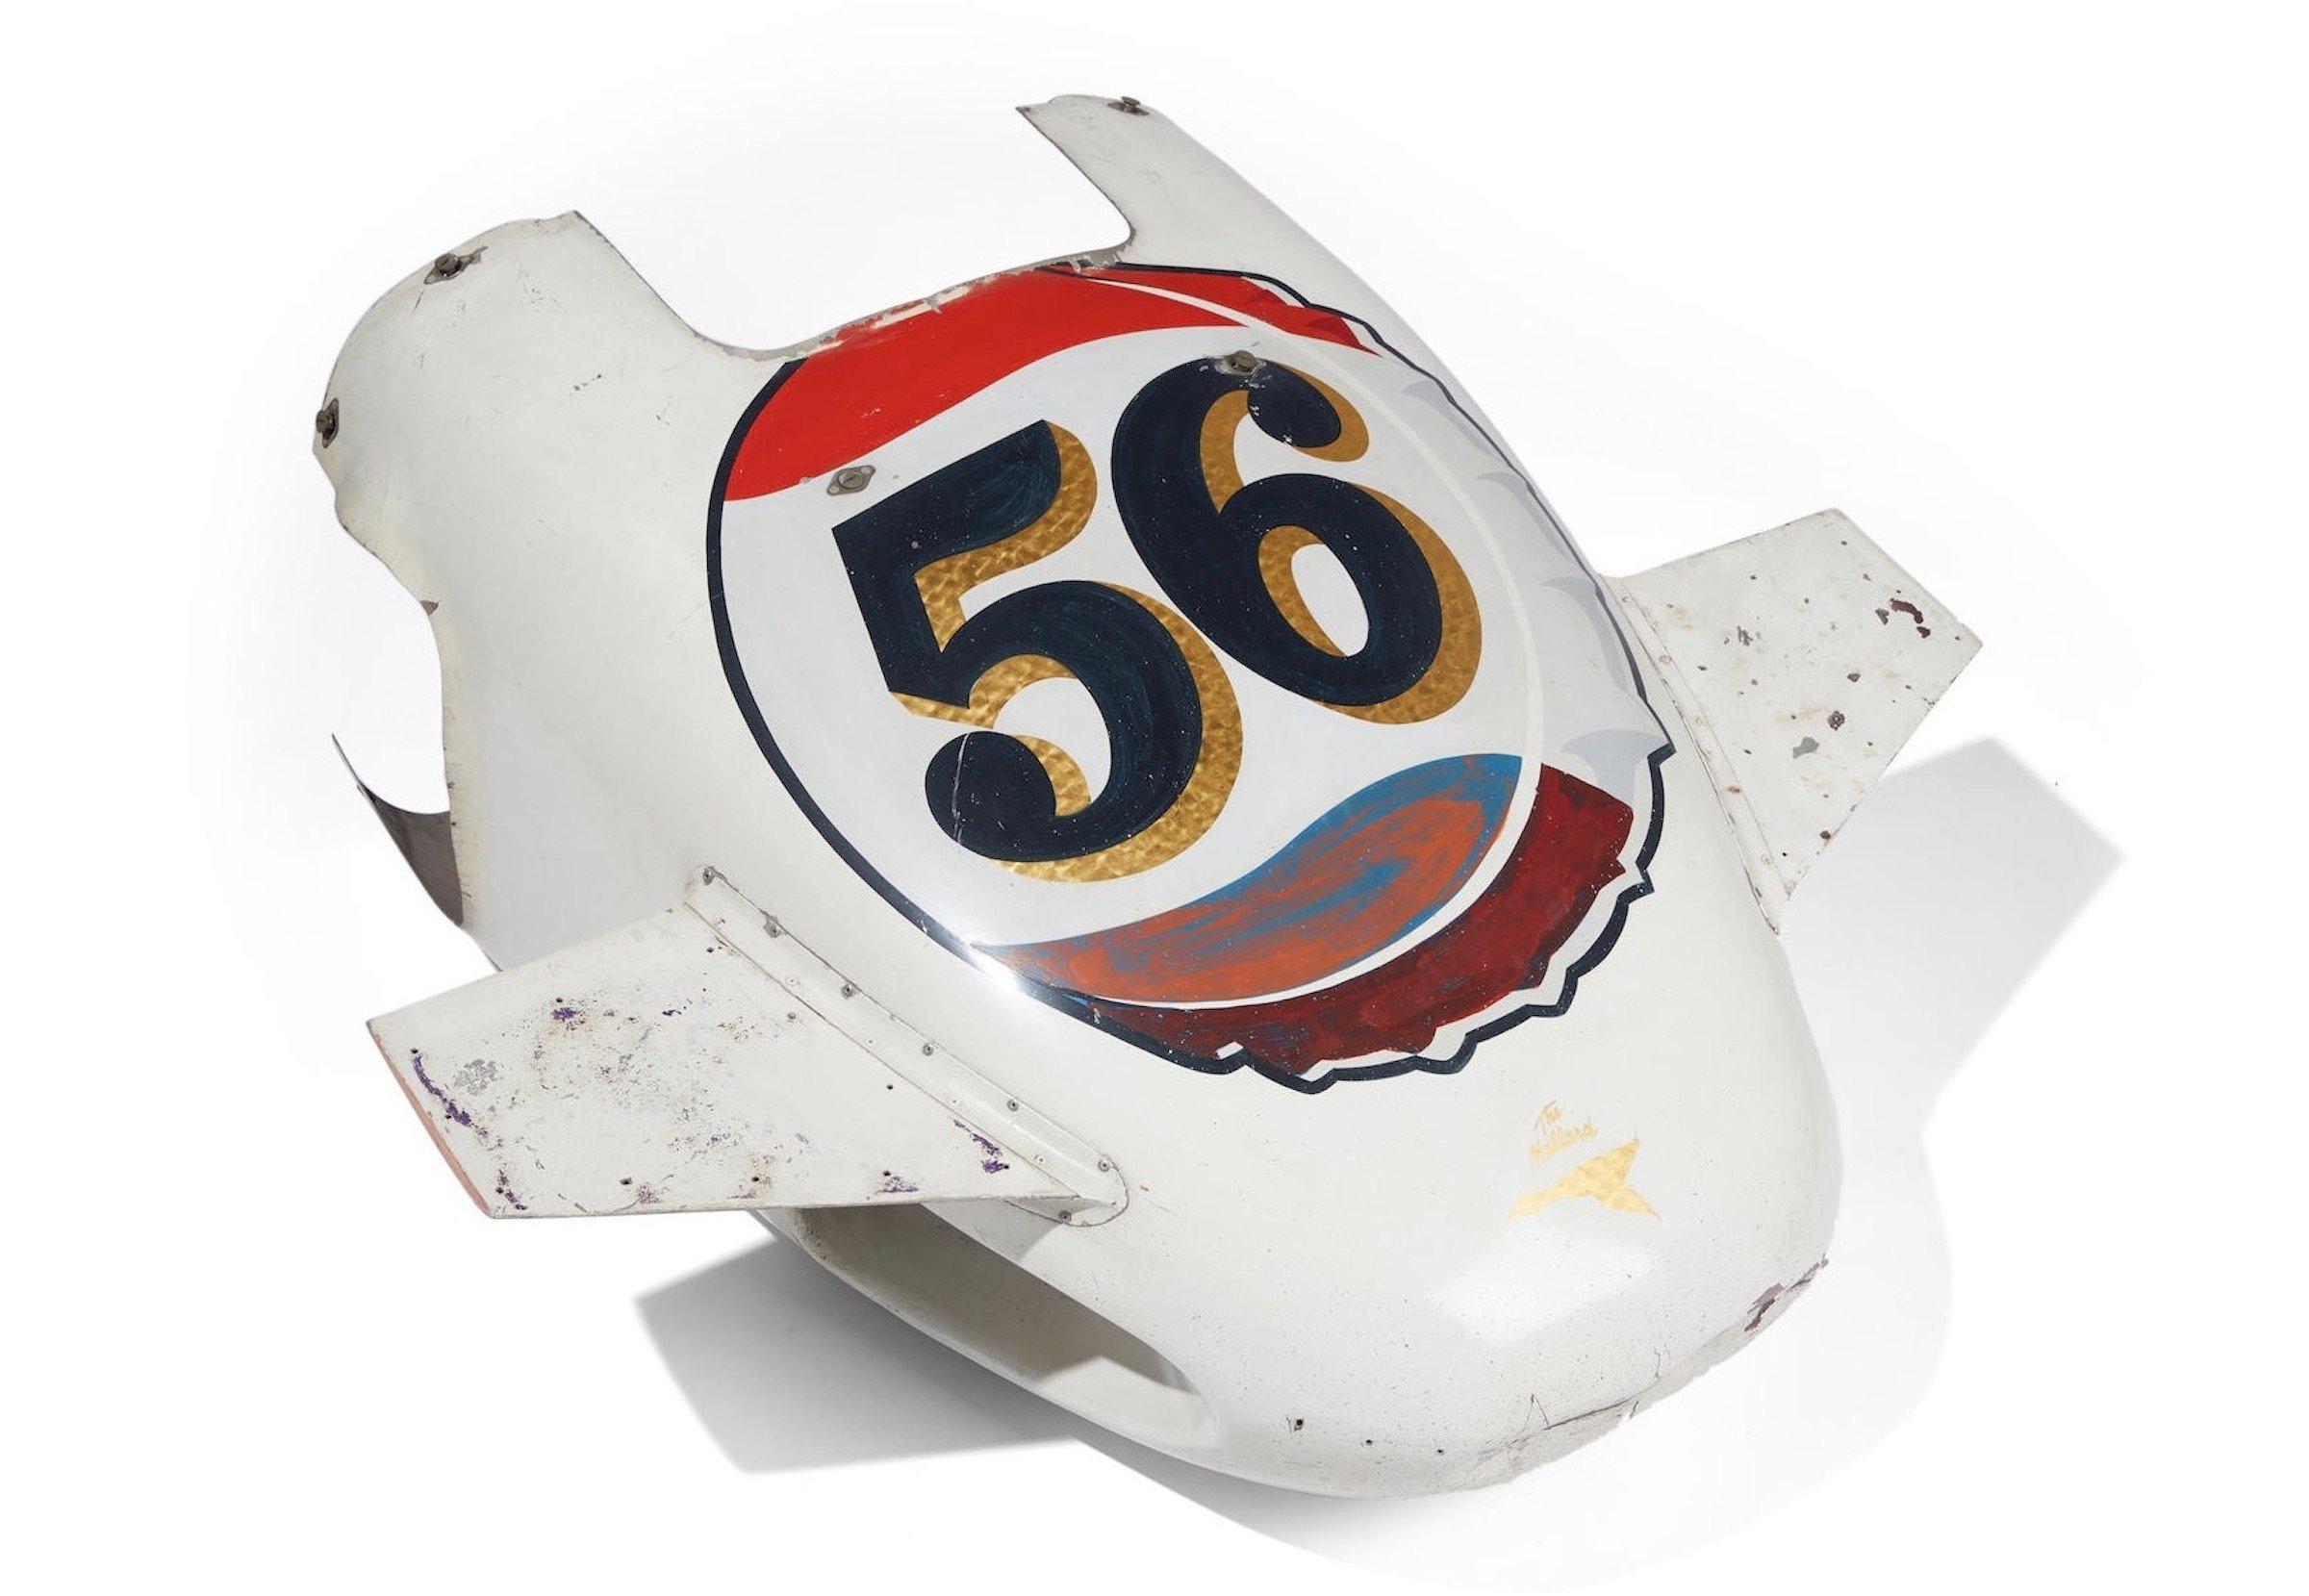 Jim Hurtubise Mallard-Offenhauser Indy 500 car